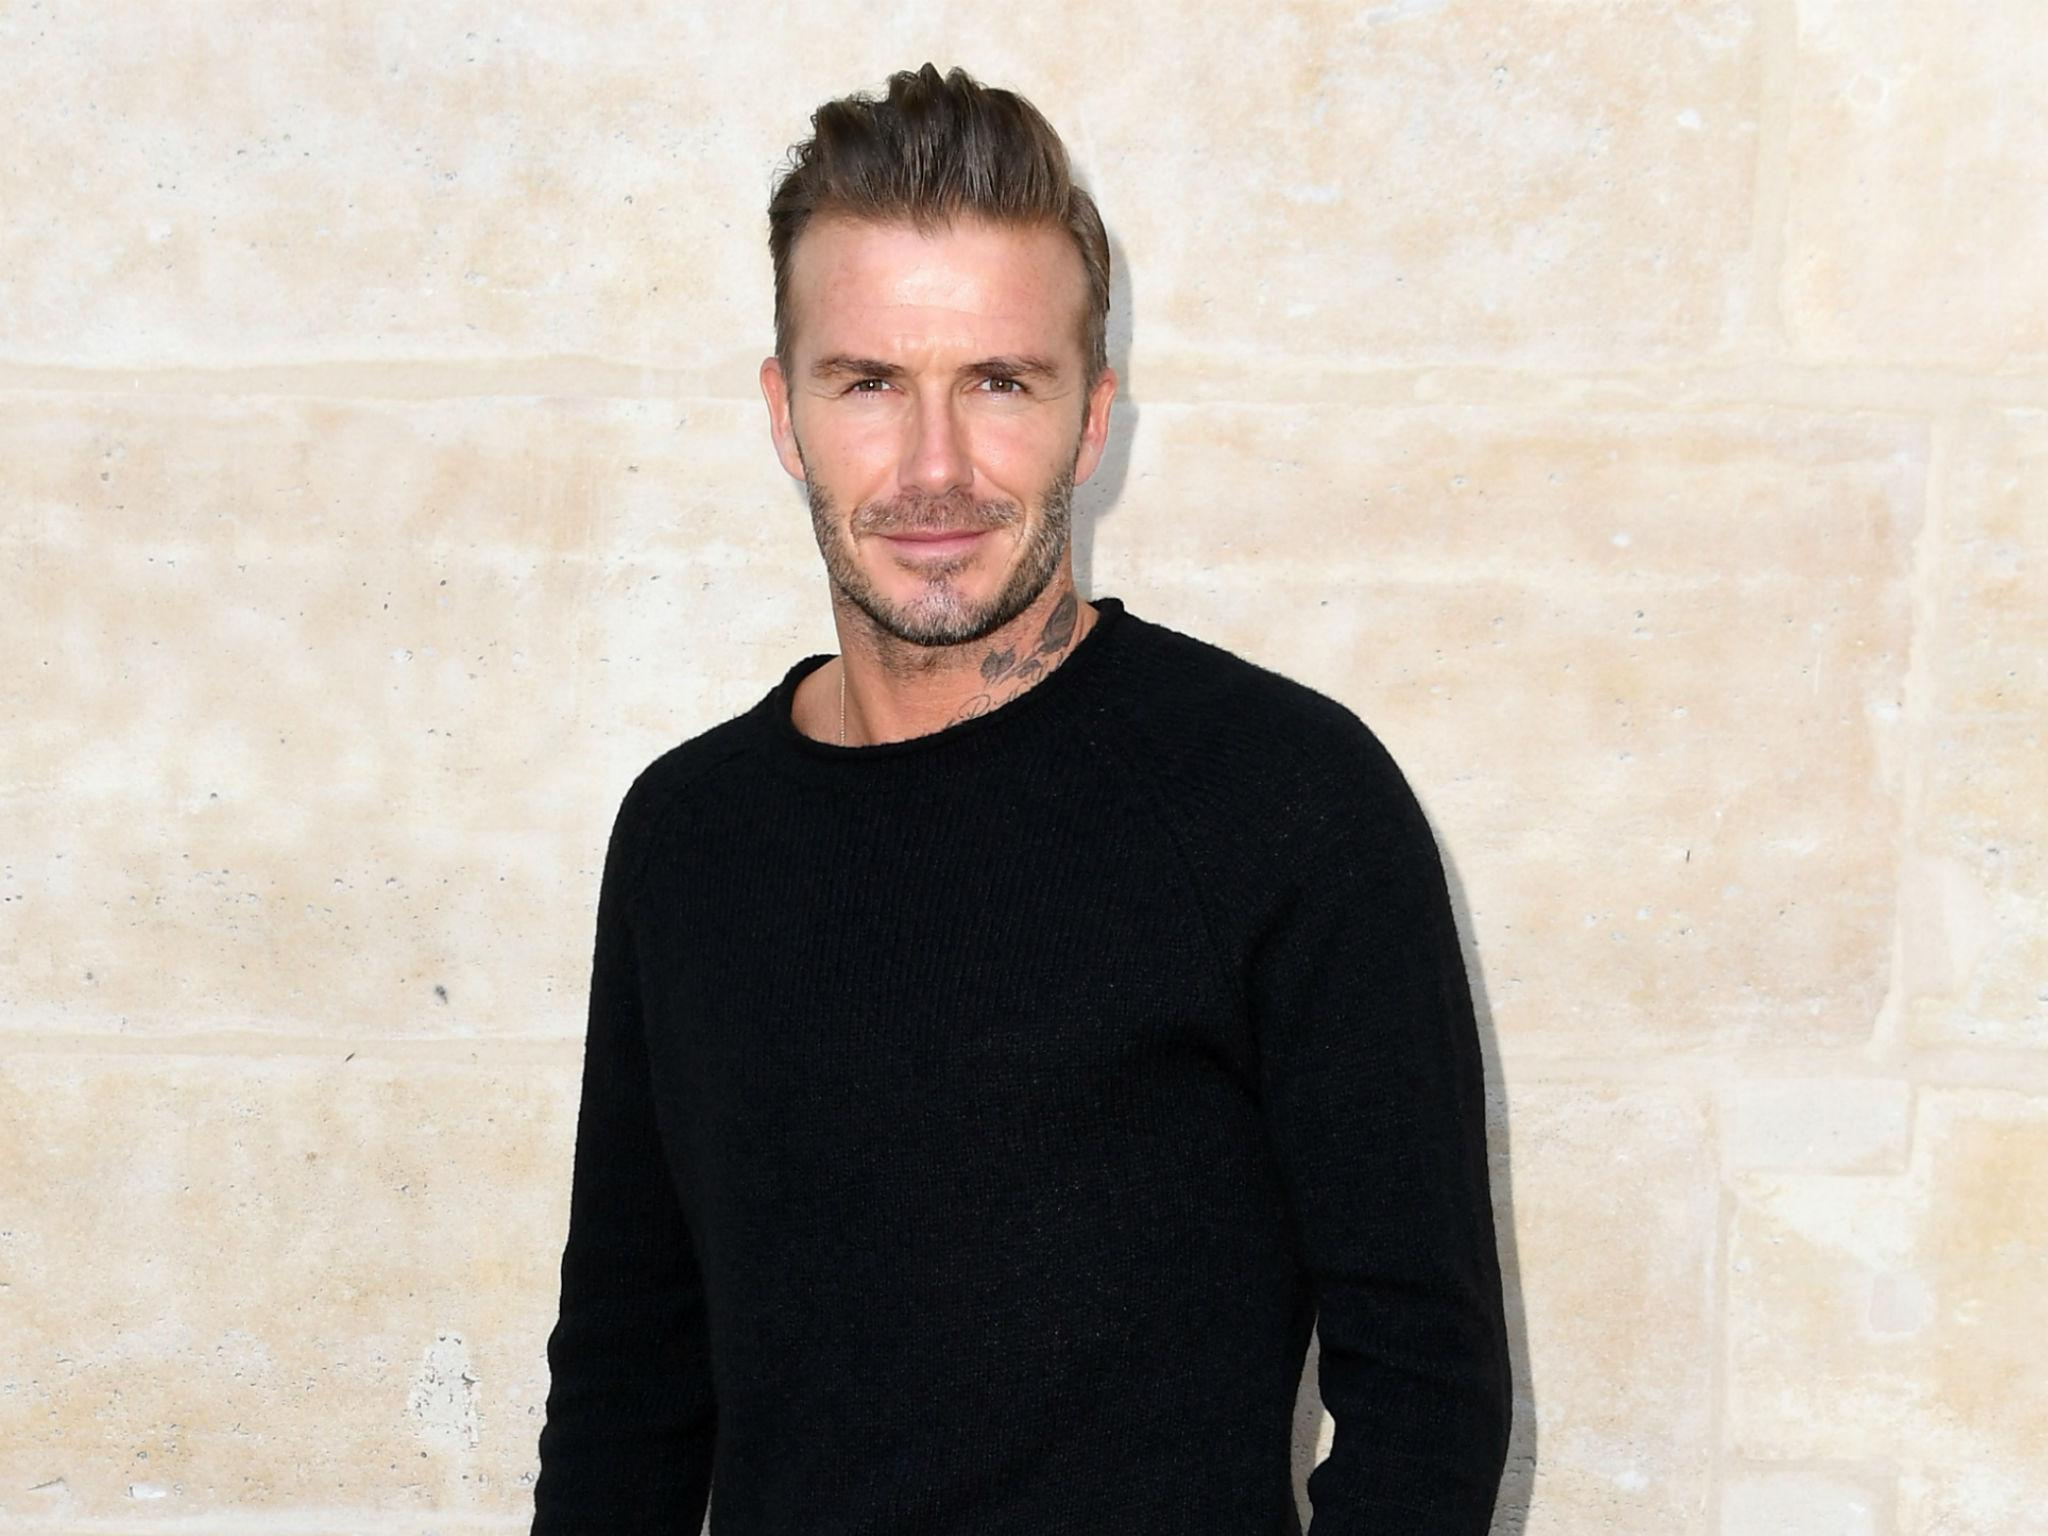 David Beckham says '... David Beckham